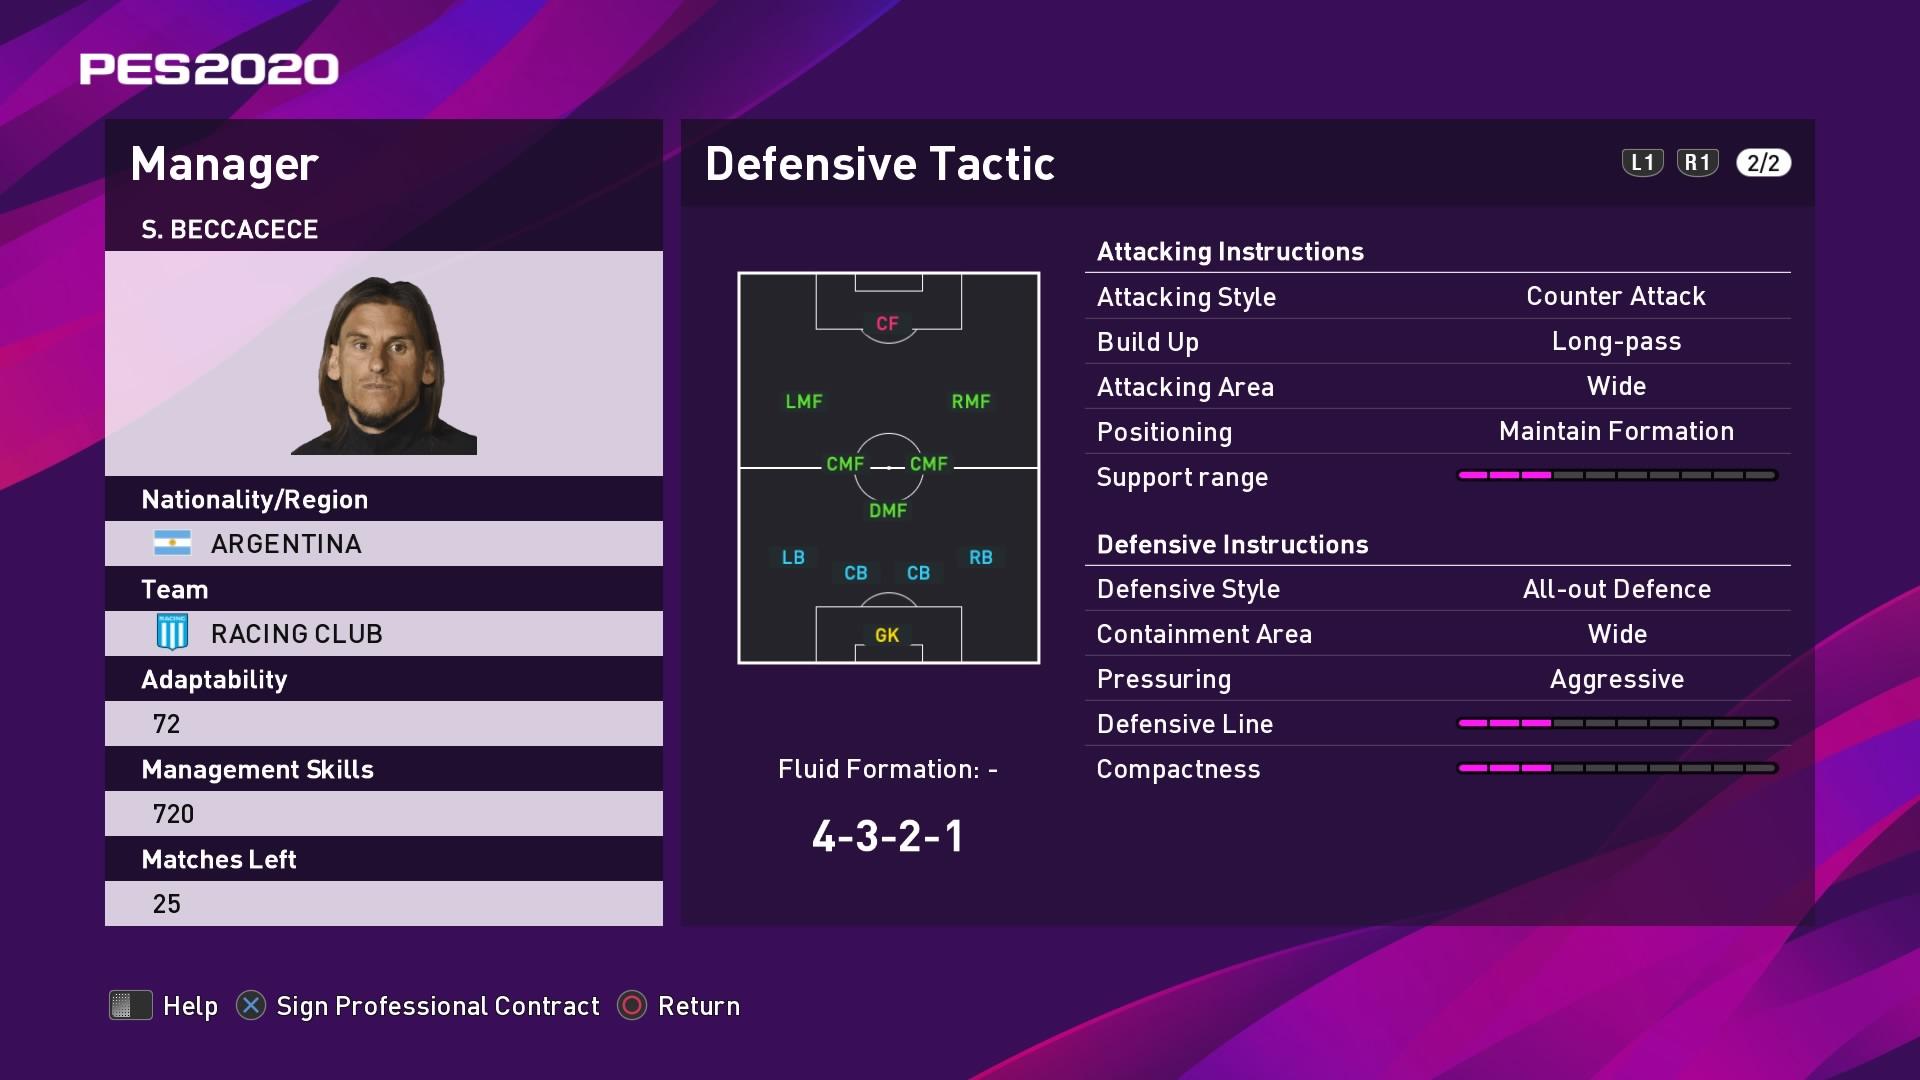 S. Beccacece (Sebastián Beccacece) Defensive Tactic in PES 2020 myClub